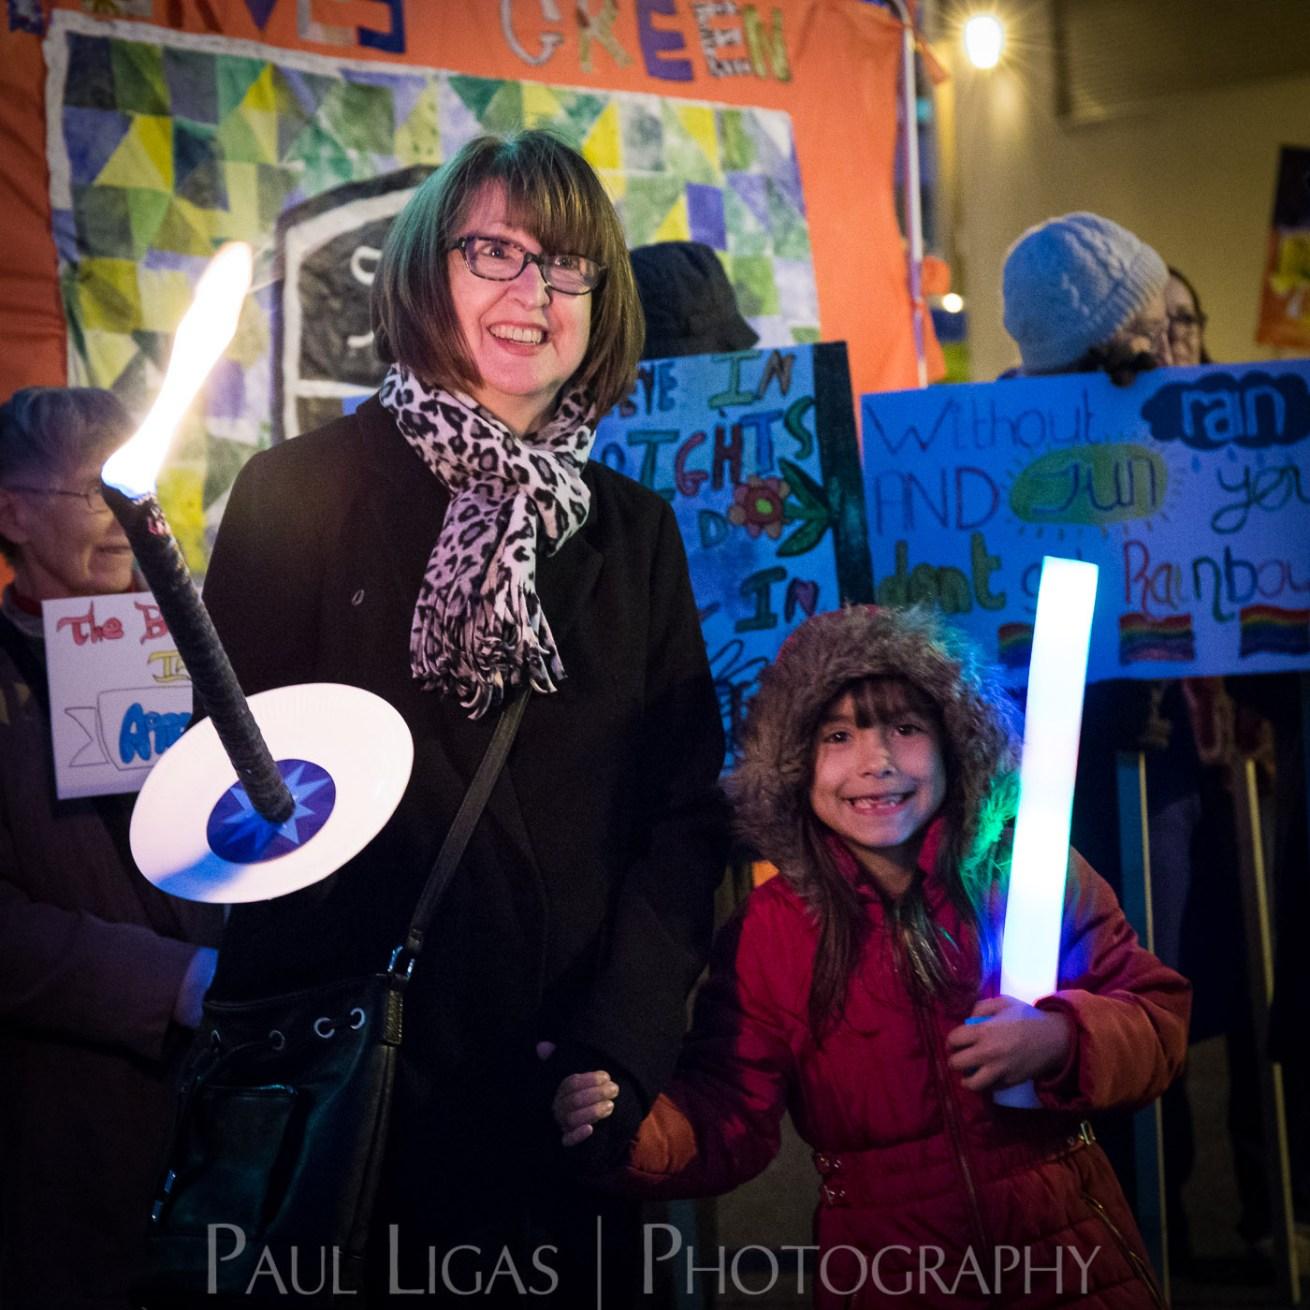 Longbridge Light Festival, Birmingham event photographer herefordshire photography people 3925